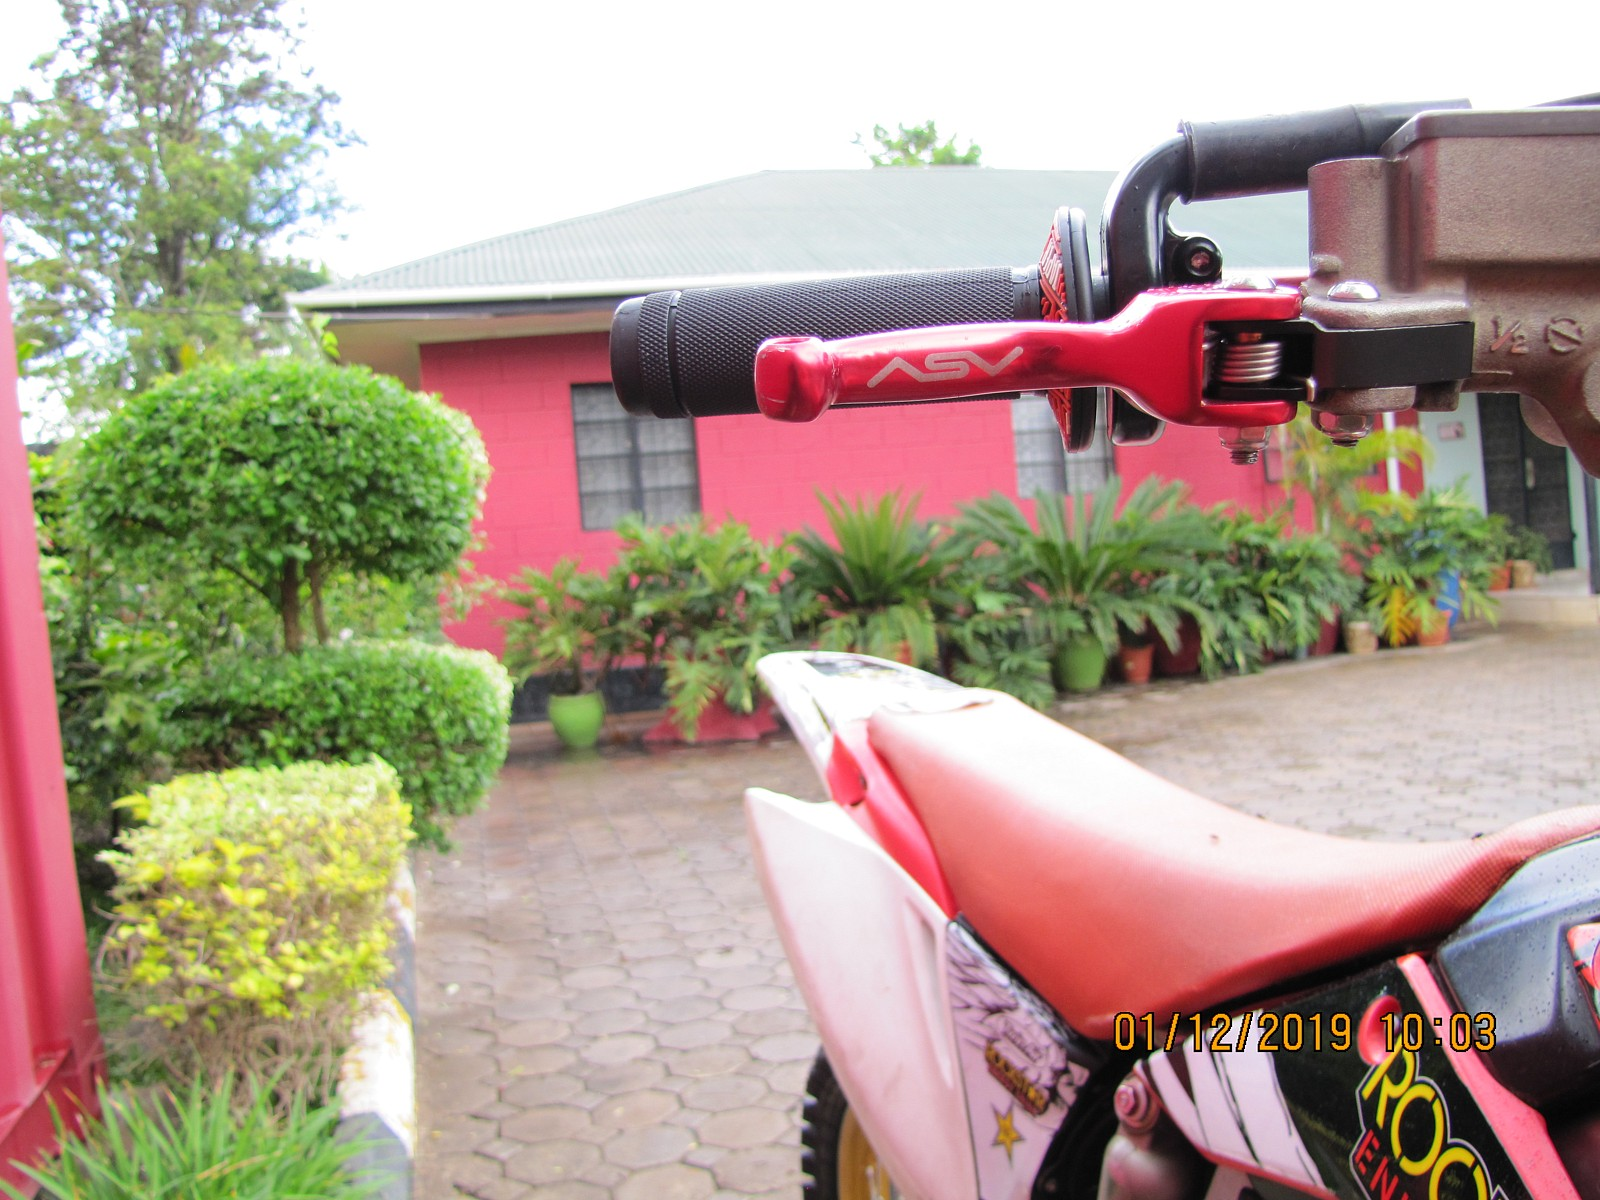 IMG 0022 - banny wailer - Motocross Pictures - Vital MX